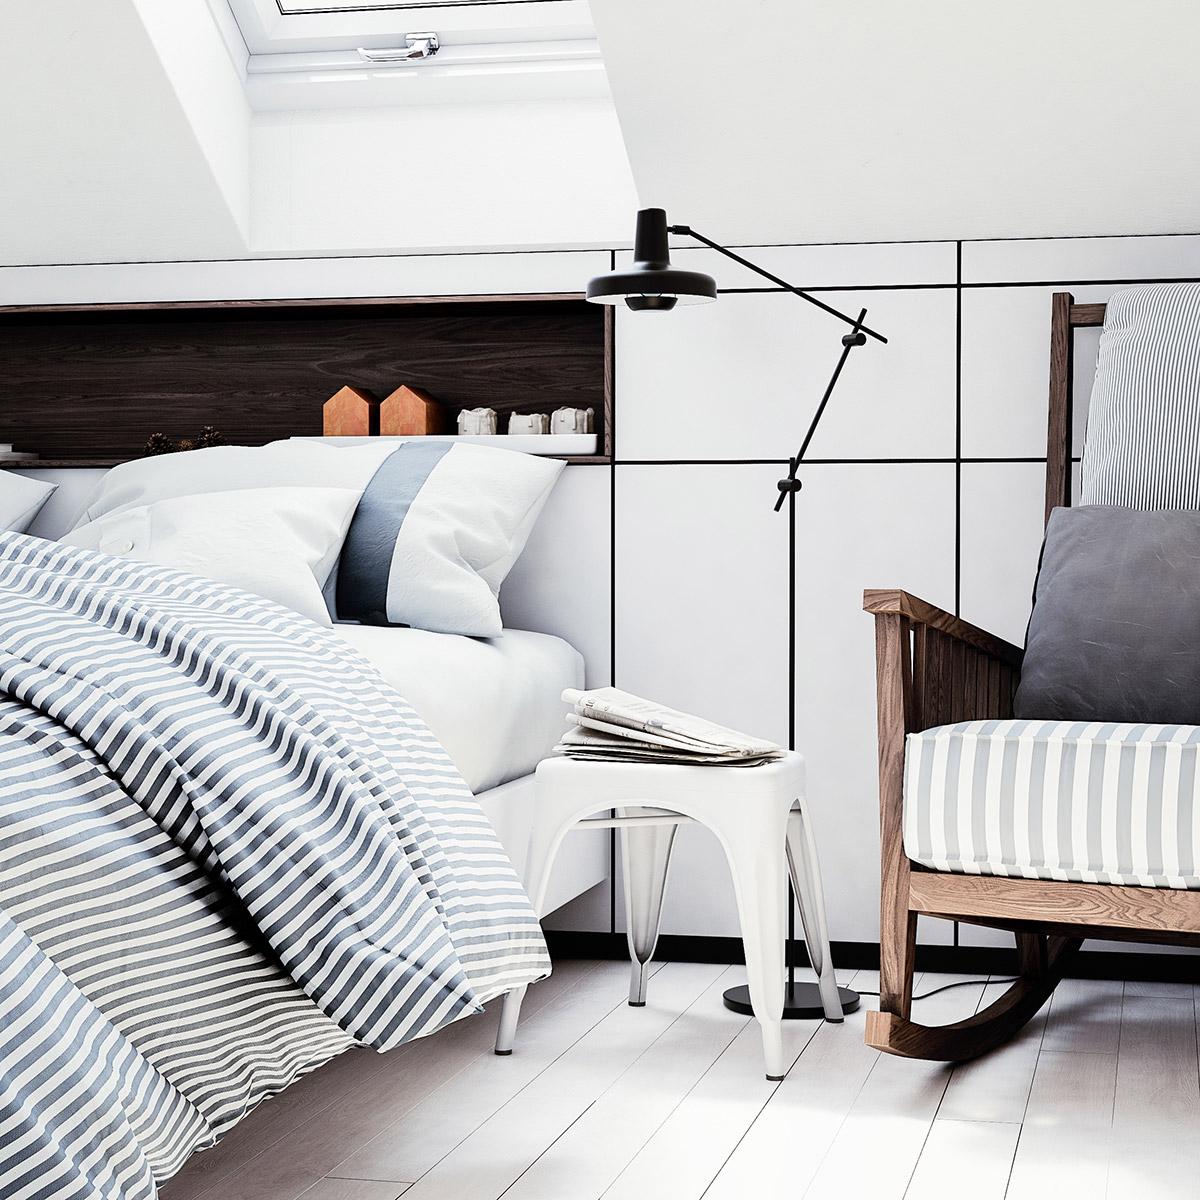 white-loft-apartment-6.jpg